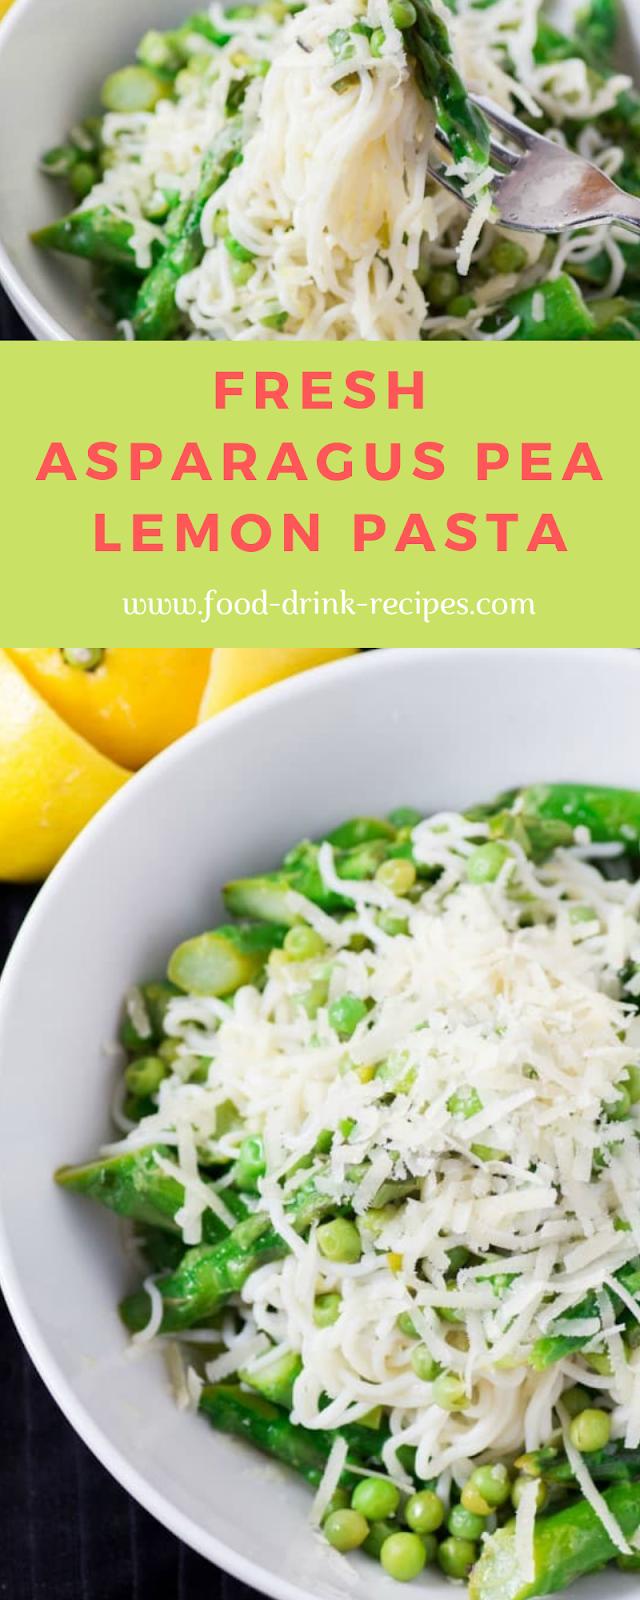 Fresh Asparagus Pea Lemon Pasta -  food-drink-recipes.com